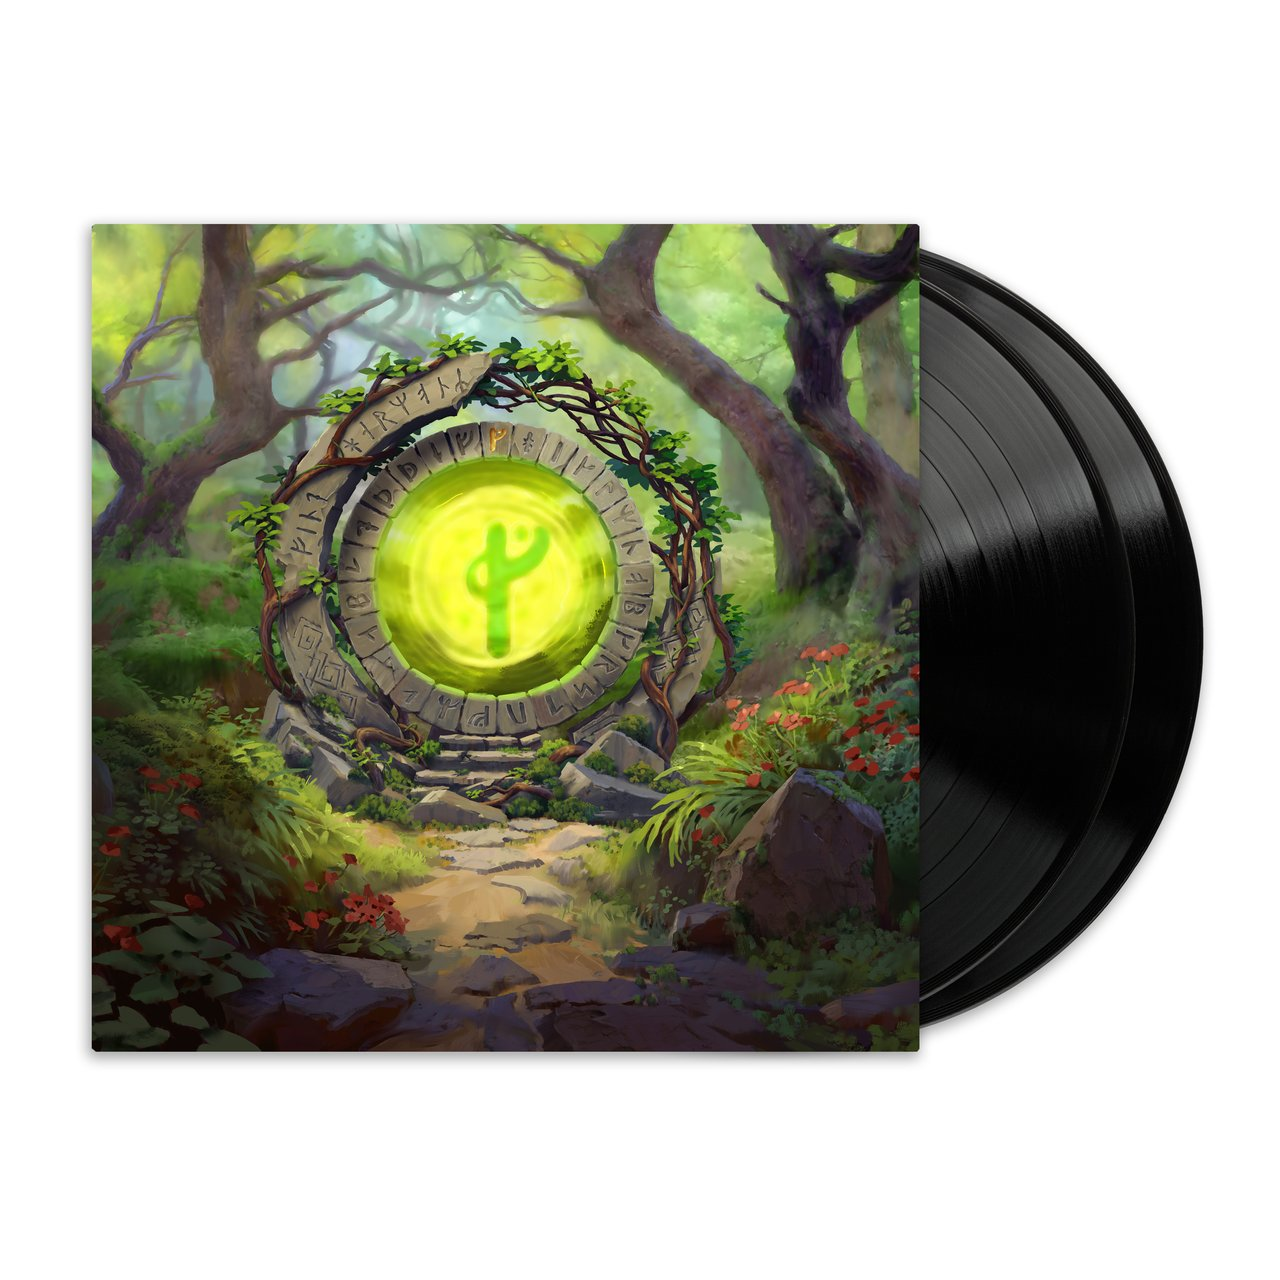 Runescape - Orchestral Album Front